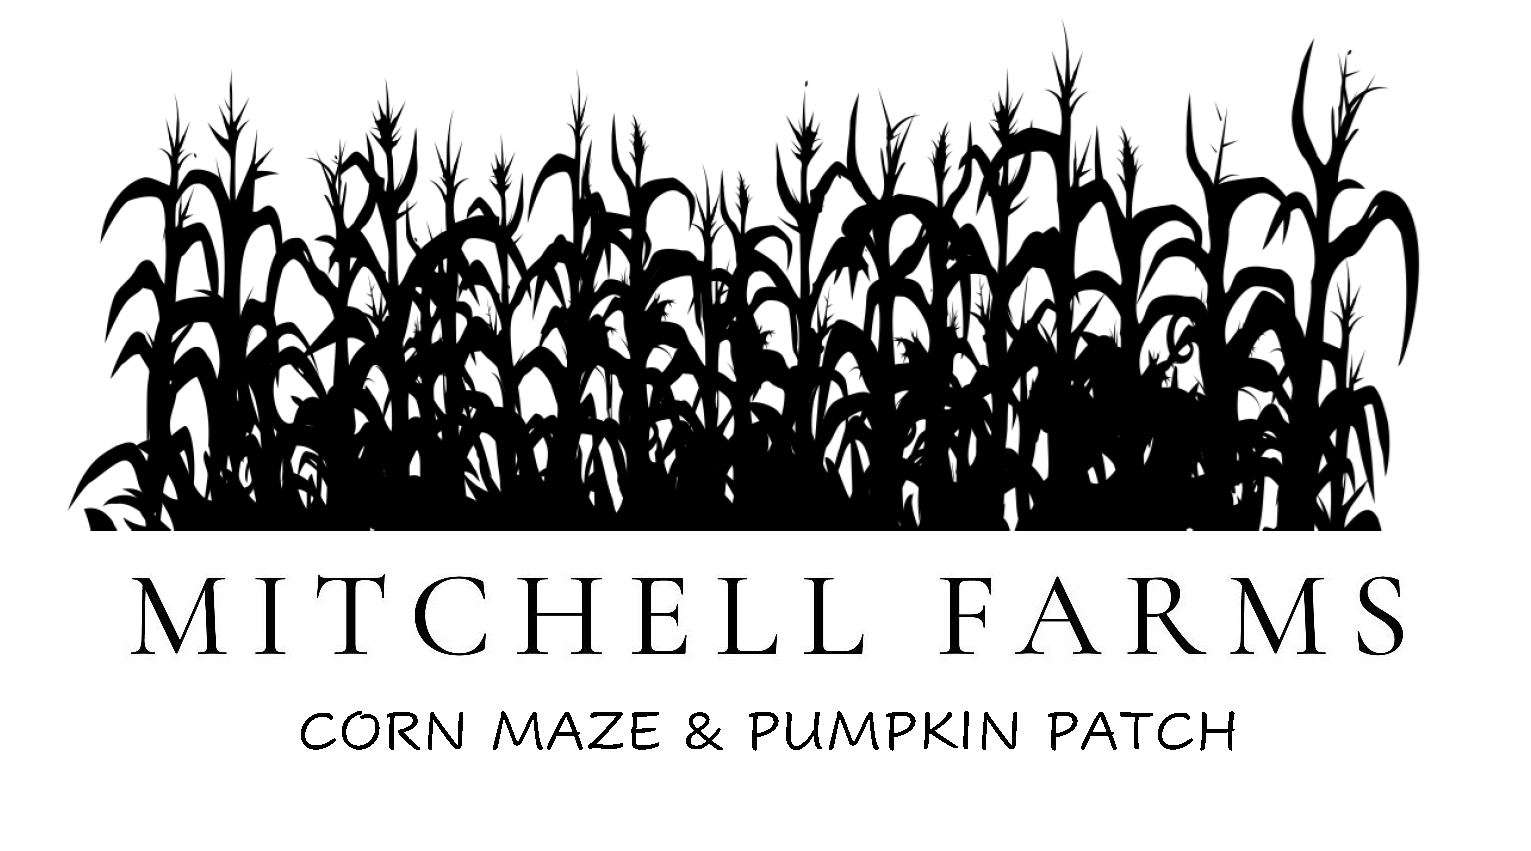 MitchellFarms